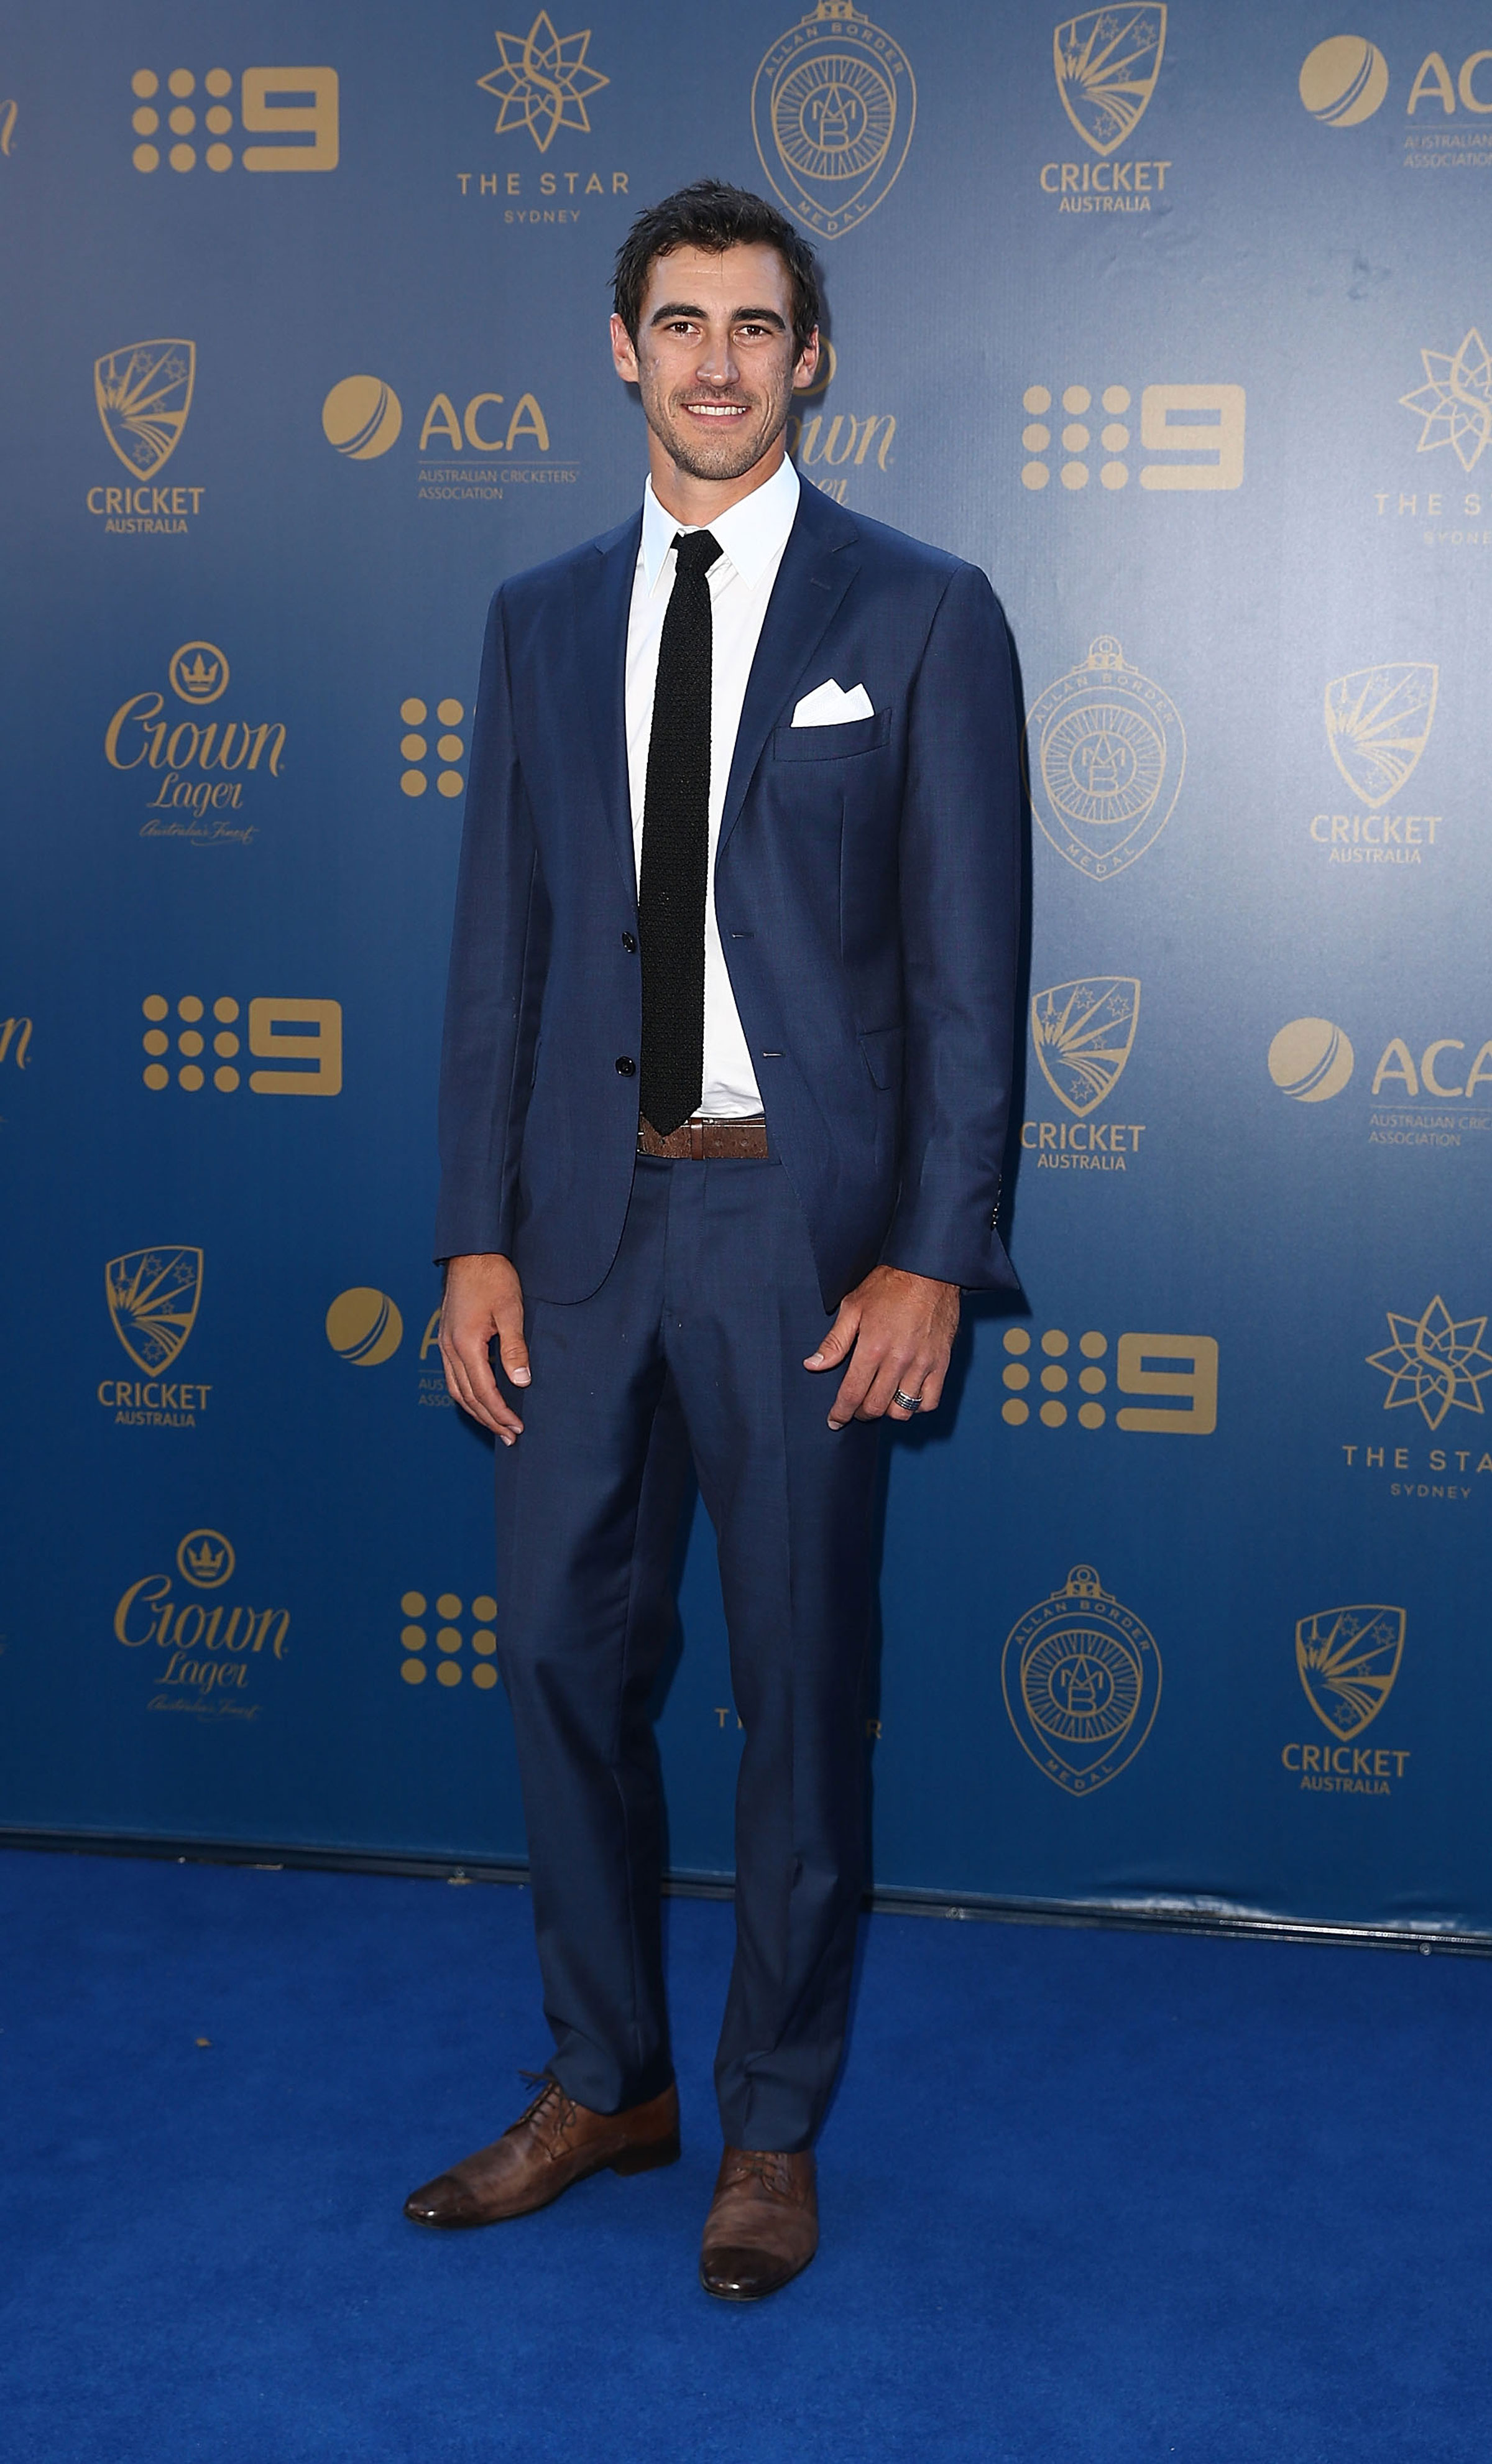 Photo Gallery: Best of AB Medal blue carpet | cricket com au